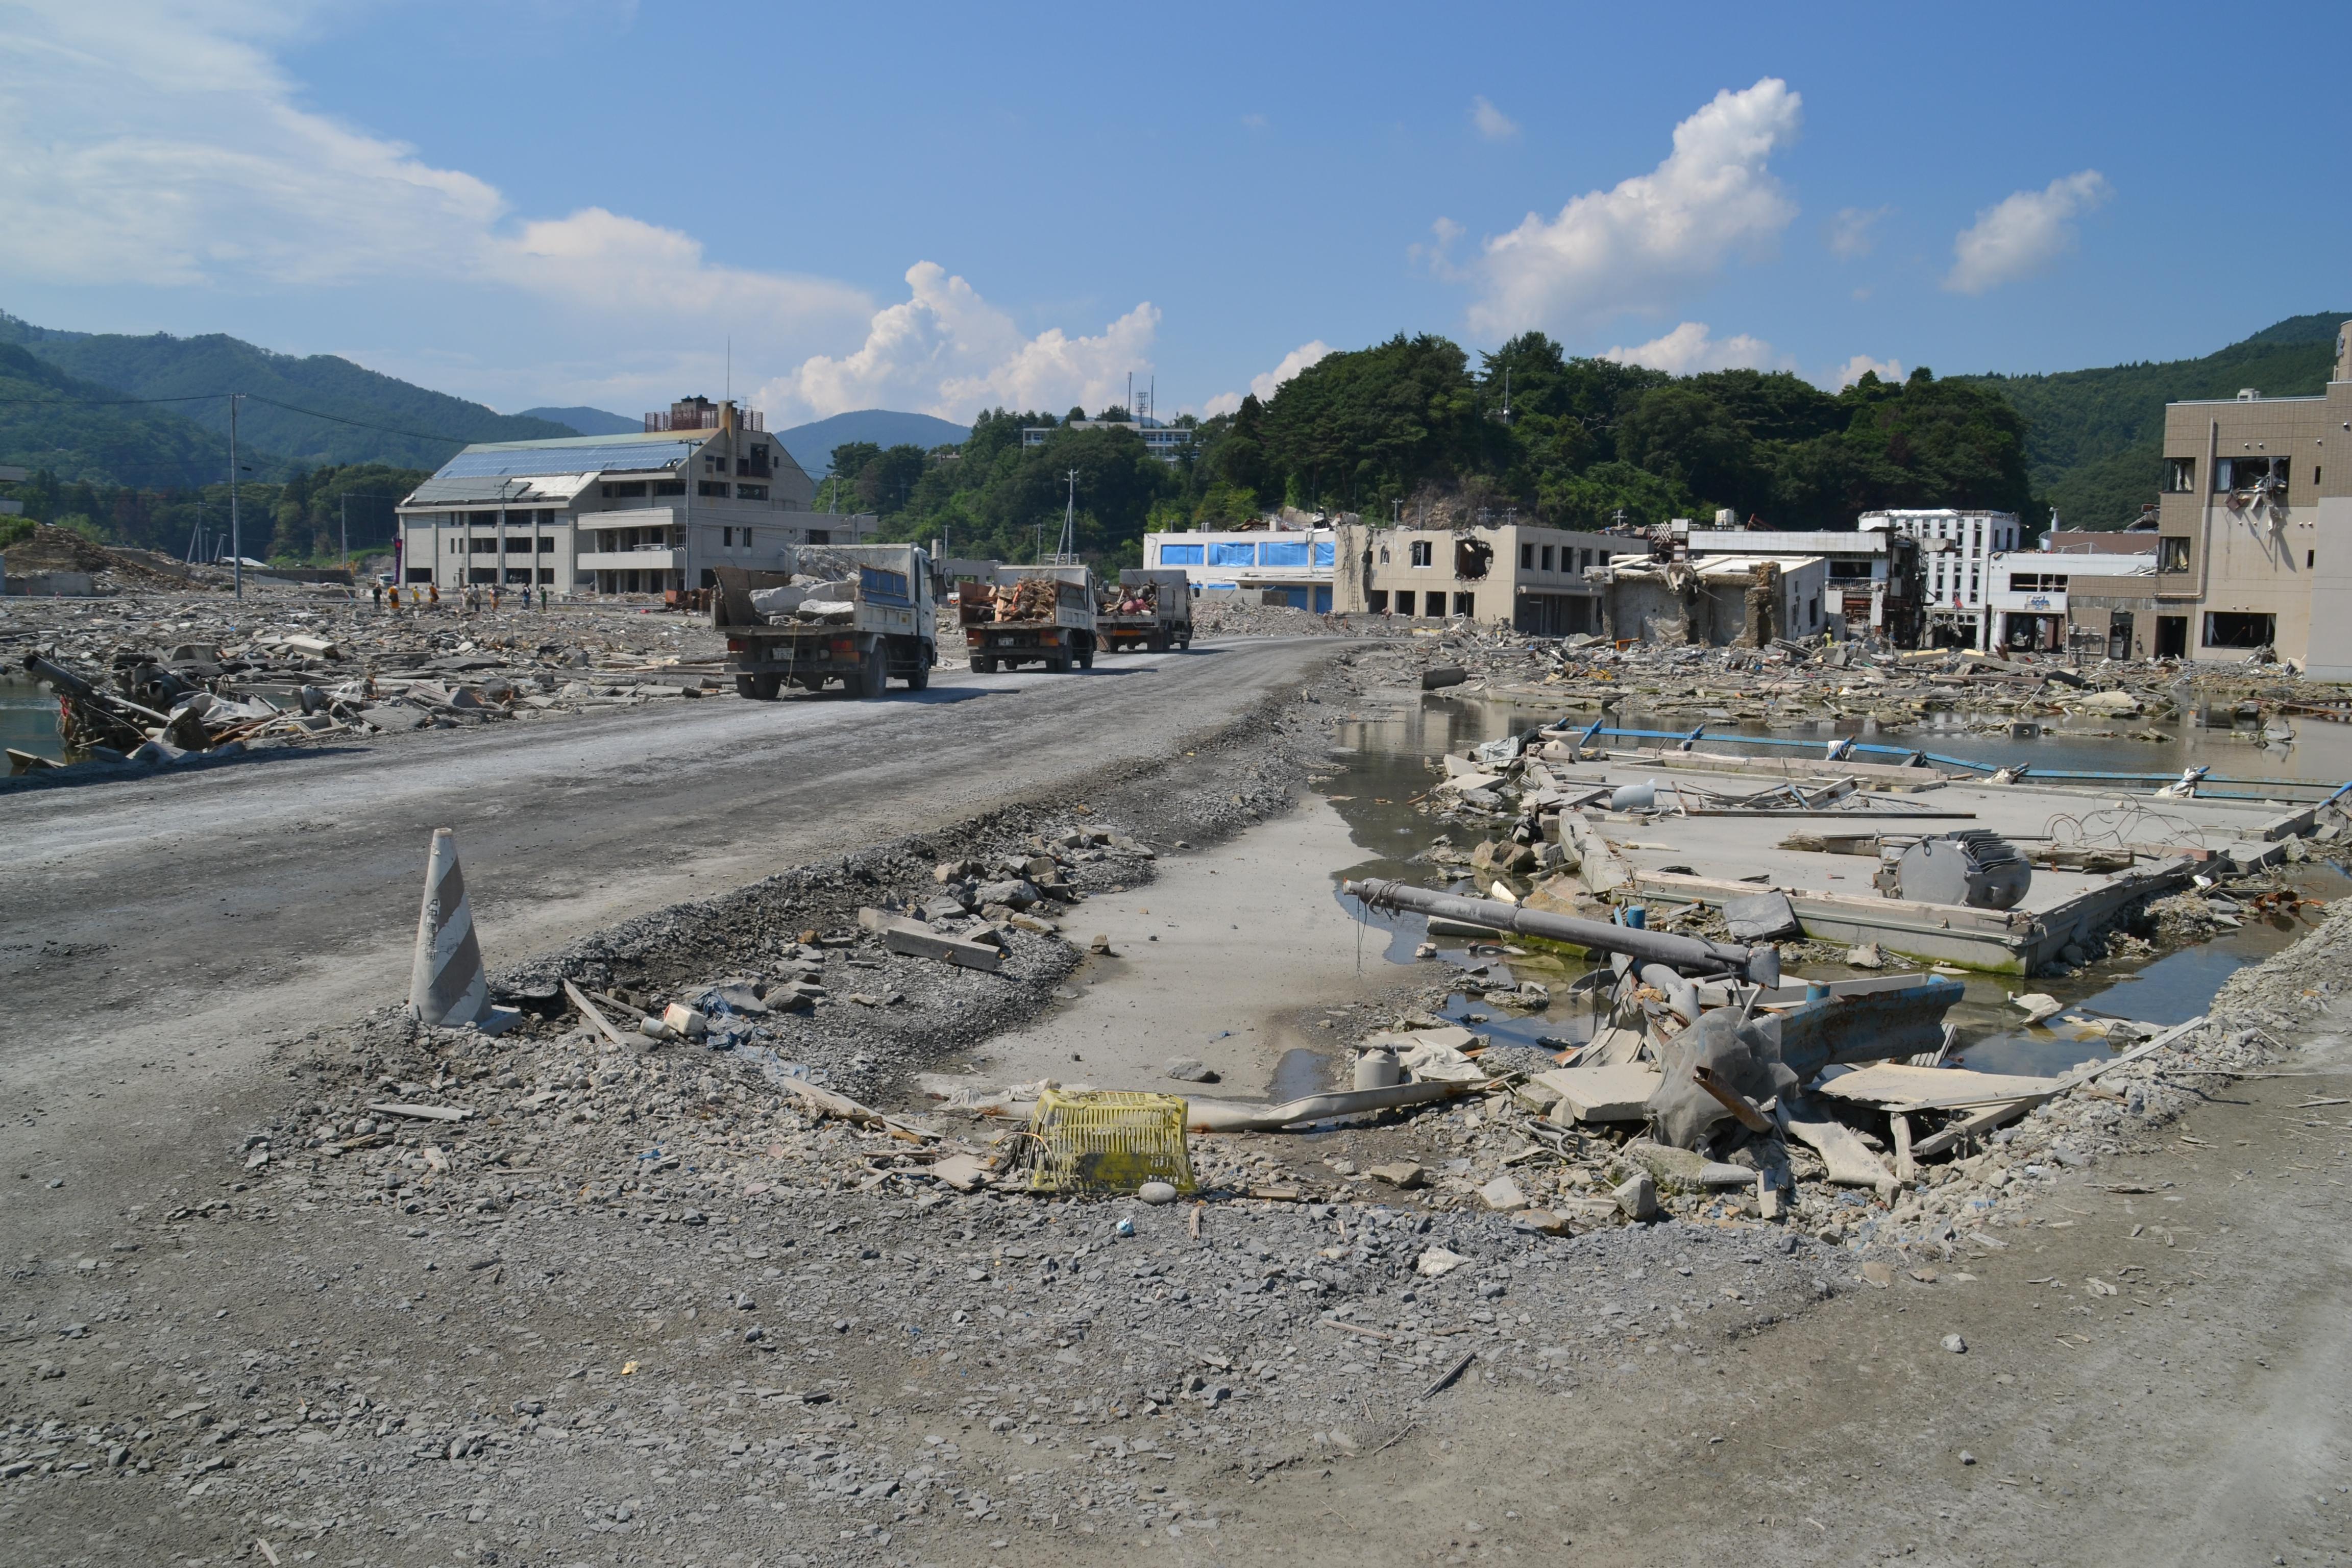 onagawa rubble town center dump trucks.JPG